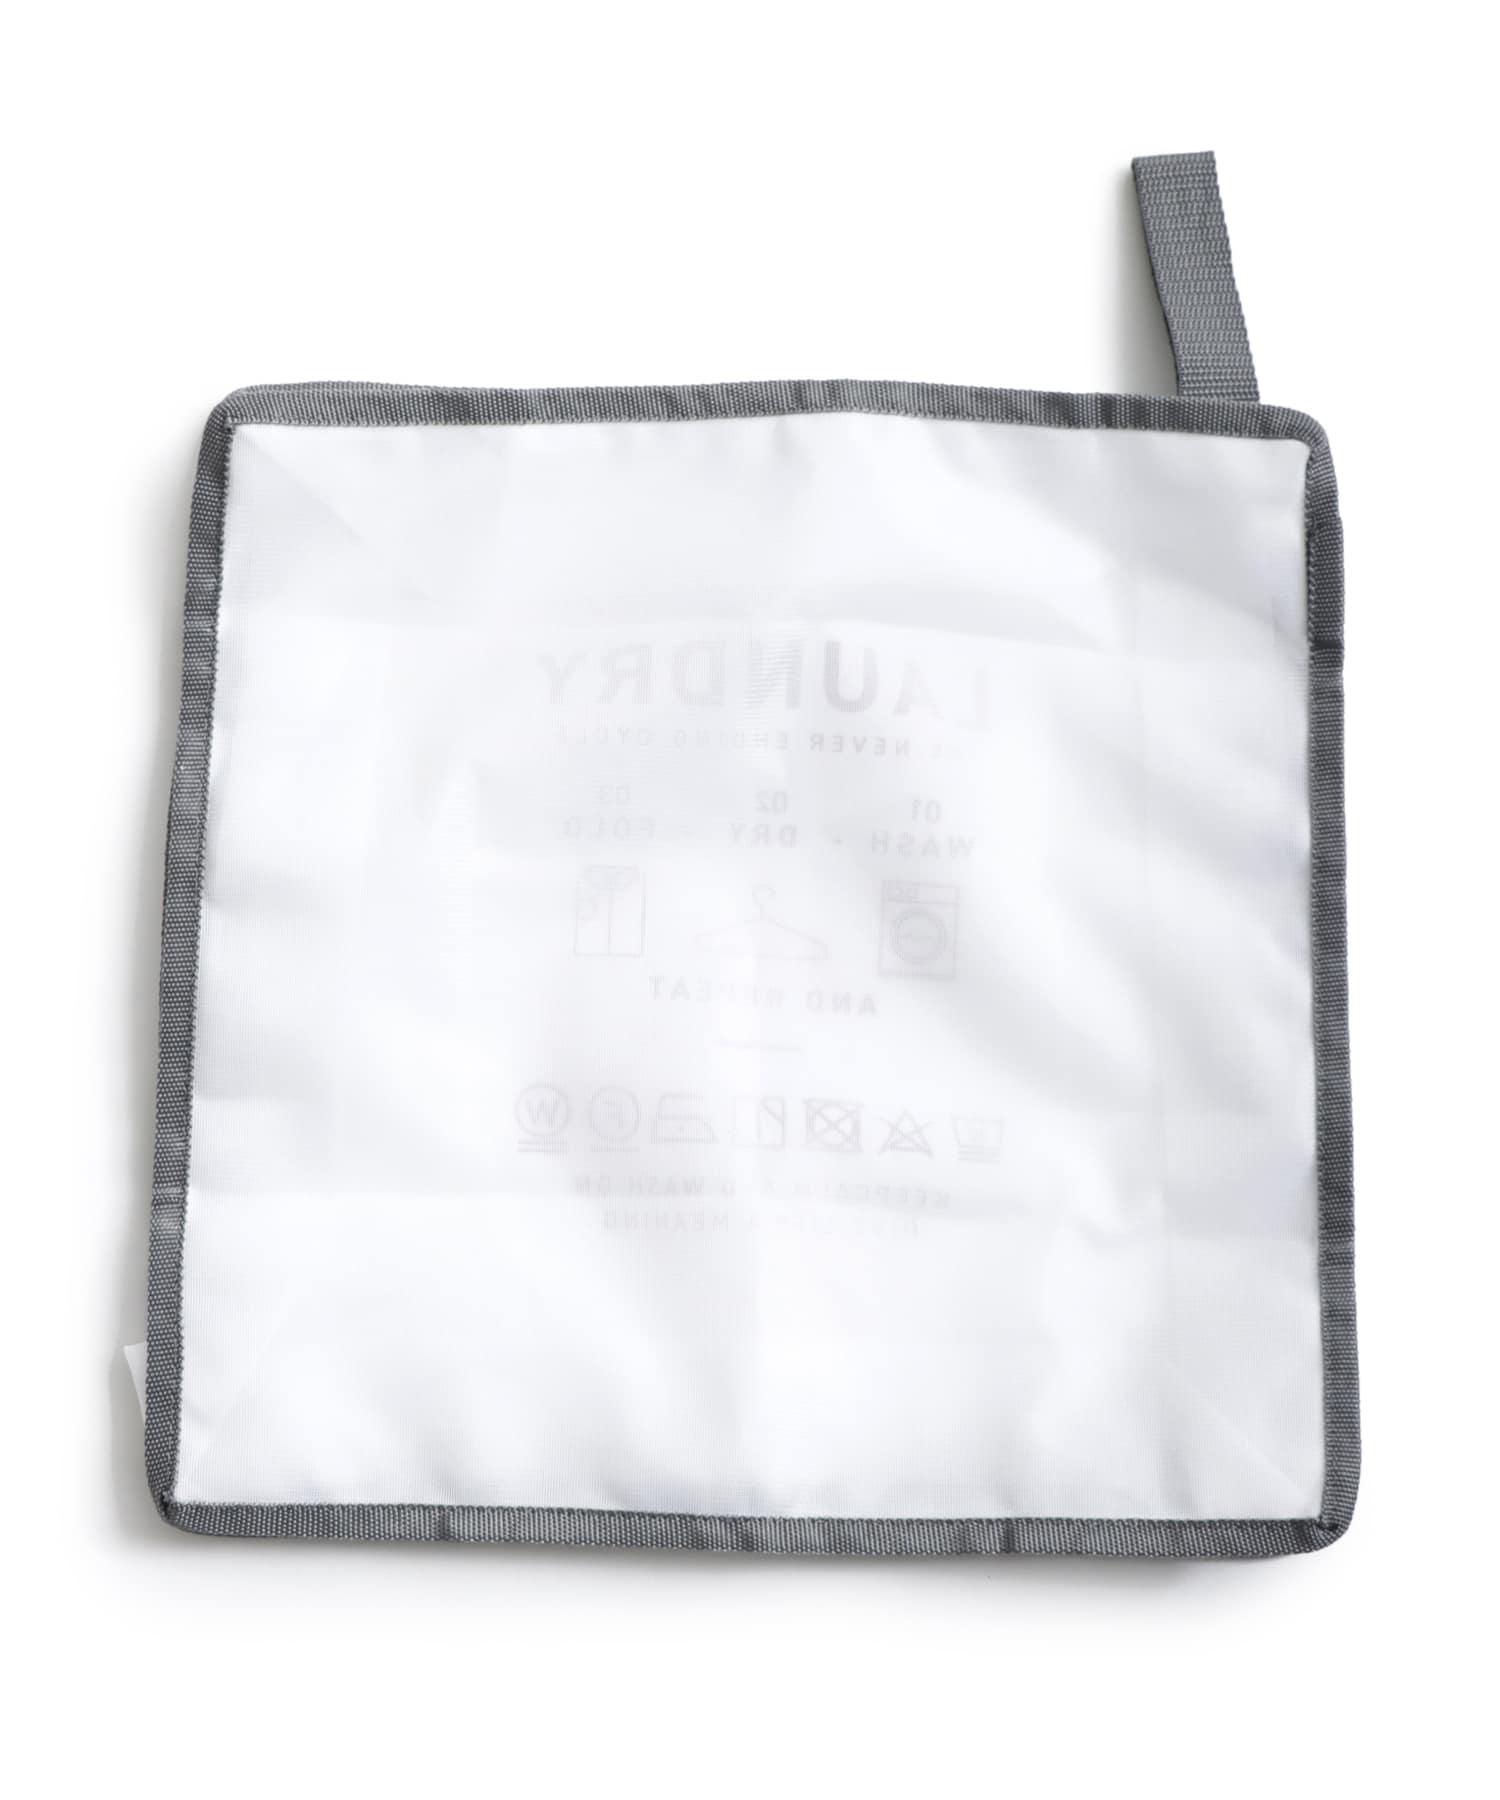 3COINS(スリーコインズ) 【お洗濯をより快適に】手洗い用ランドリーネット